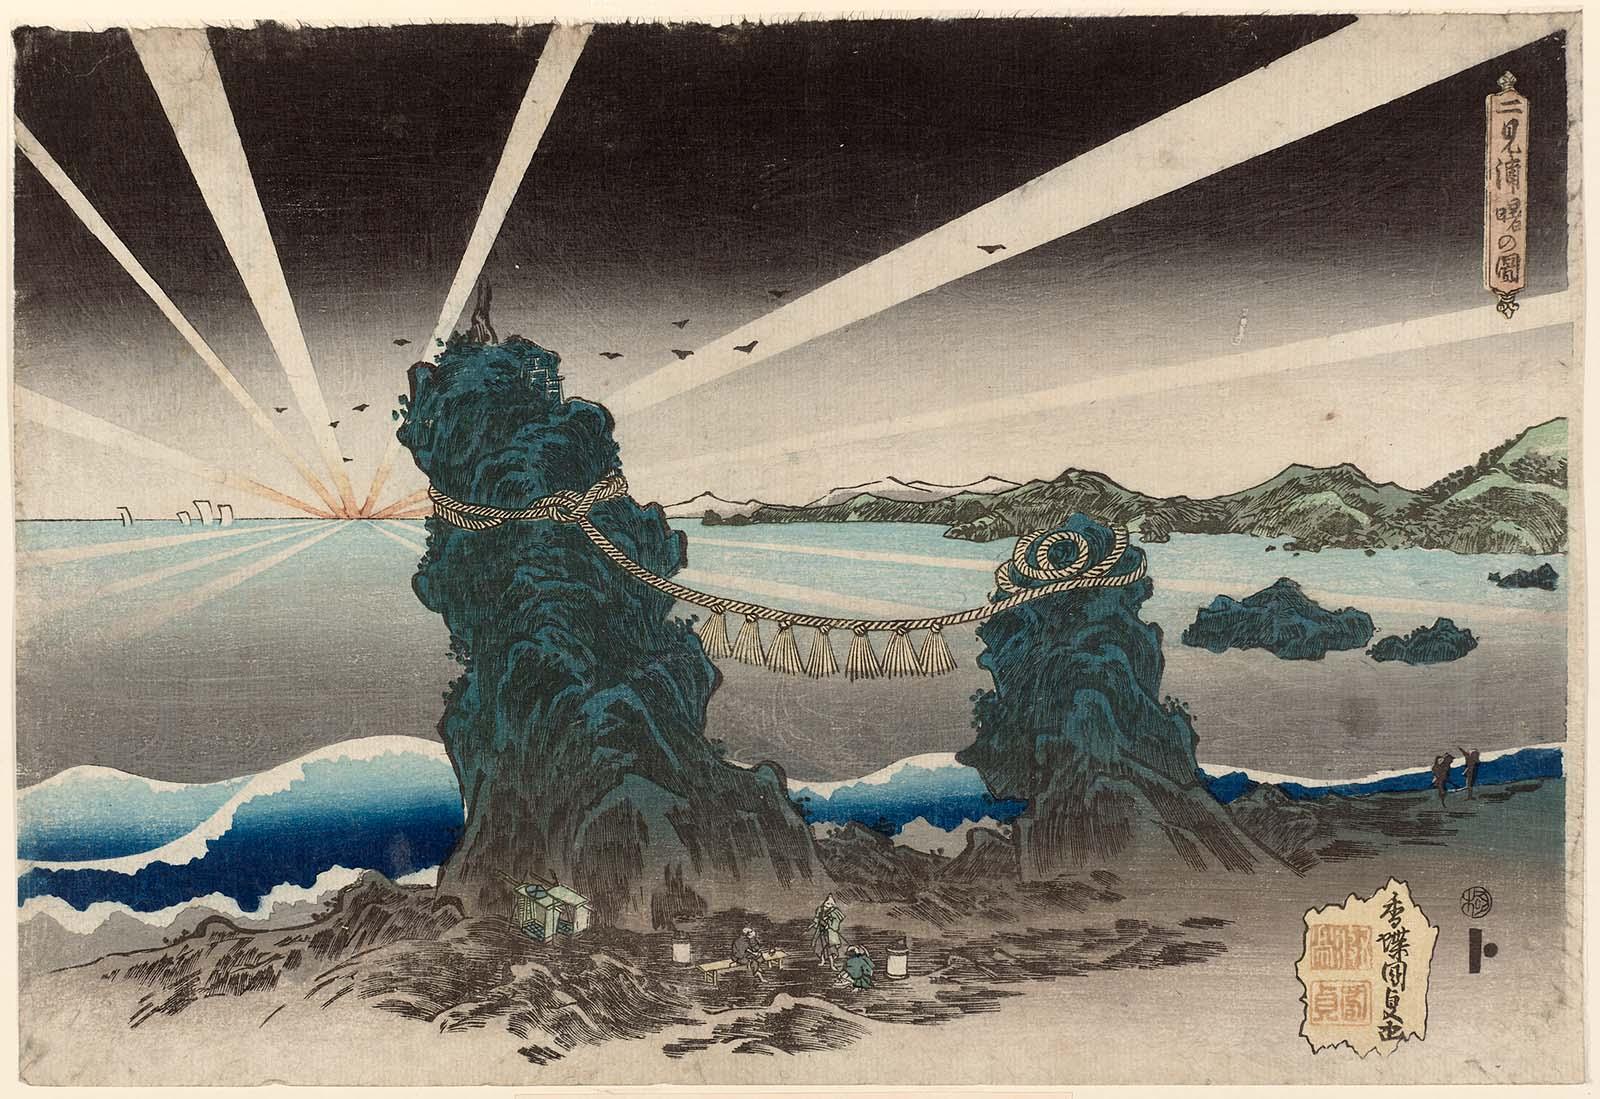 Inspirational Japanese Woodblock Printing